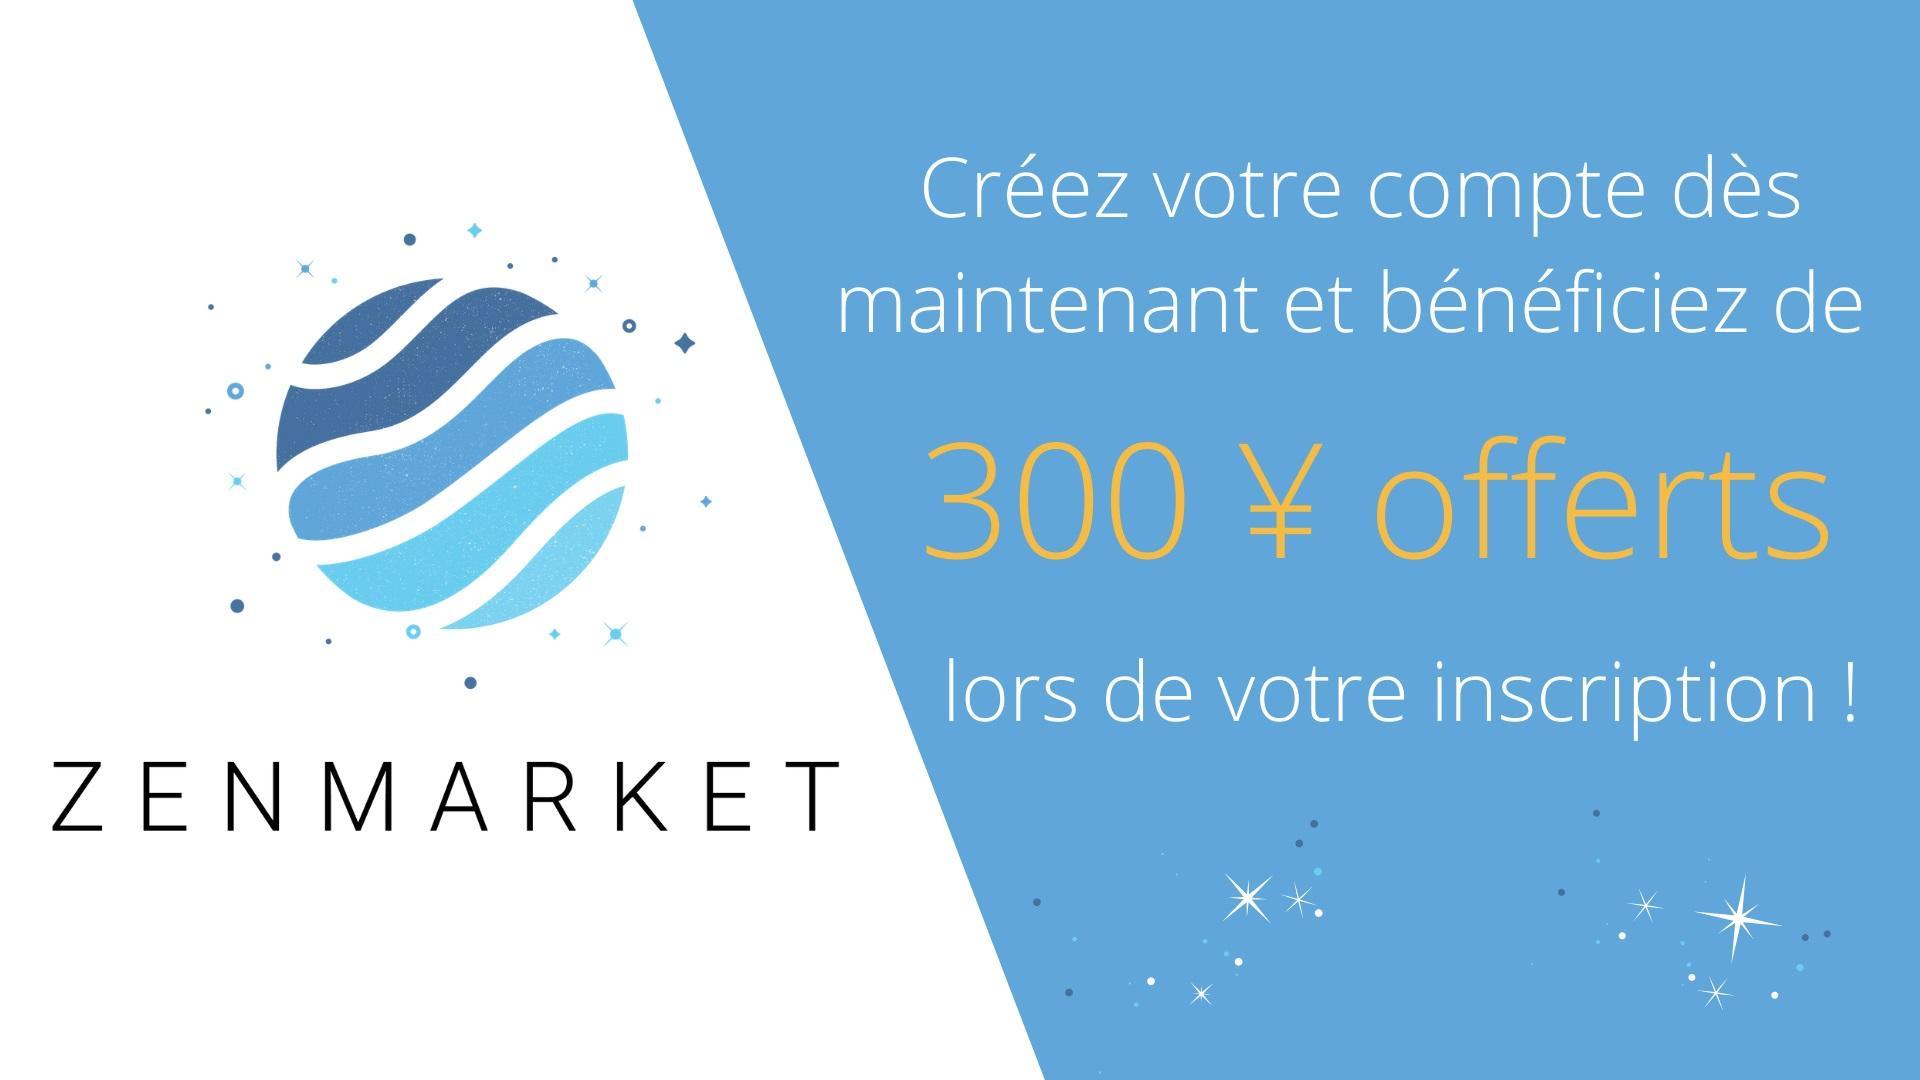 zenmarket offre yens creation compte